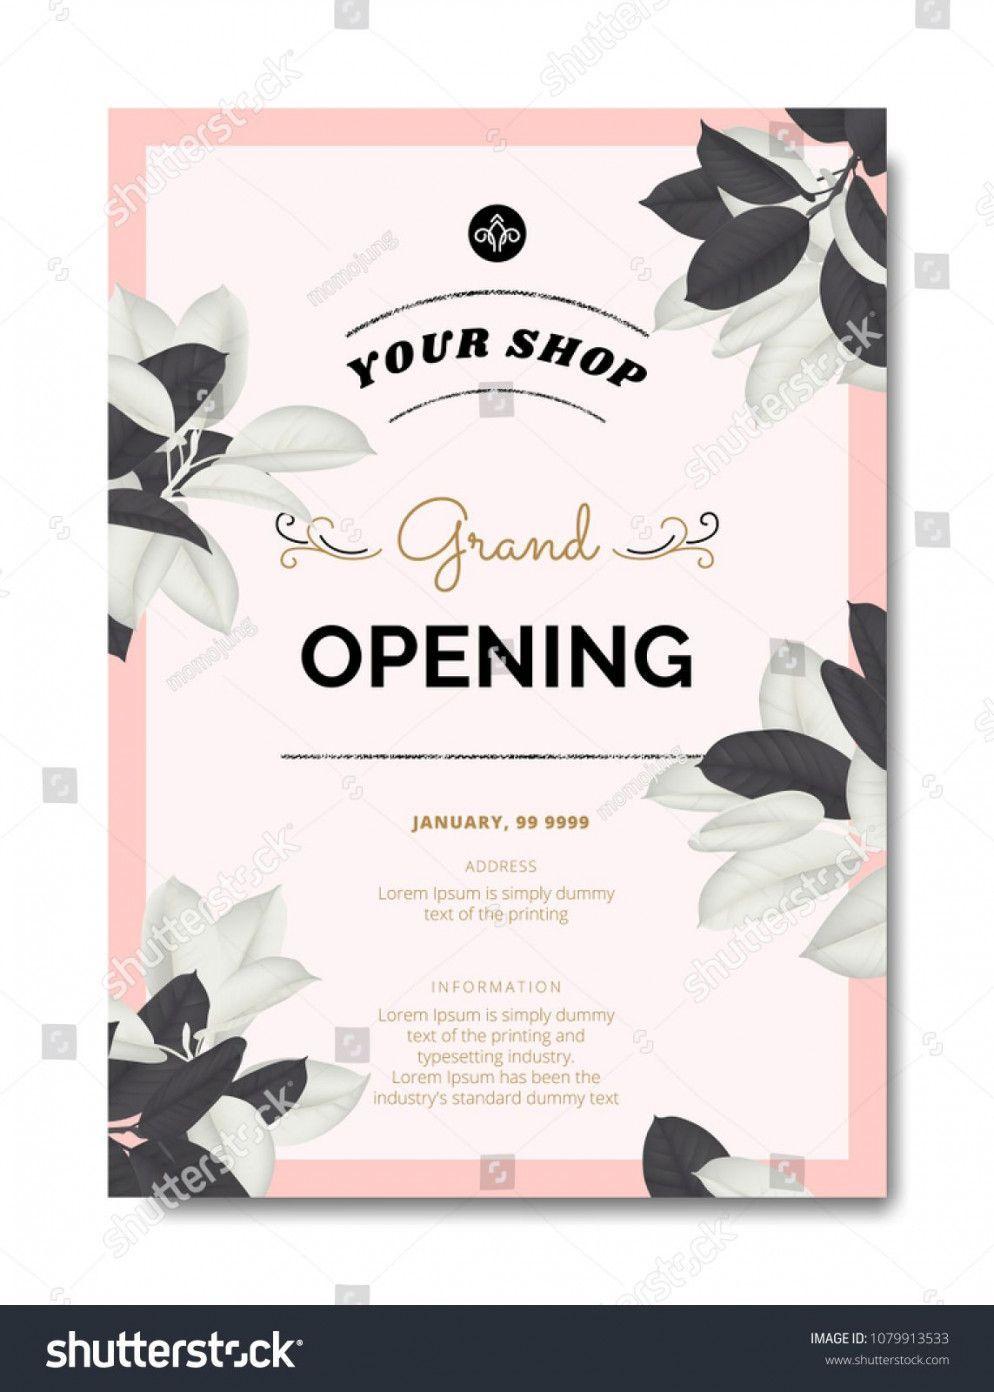 Card Inauguration Invitation Sample Vector Inauguration Invitation Card Samp In 2020 Shop Opening Invitation Card Invitation Card Sample Grand Opening Invitations